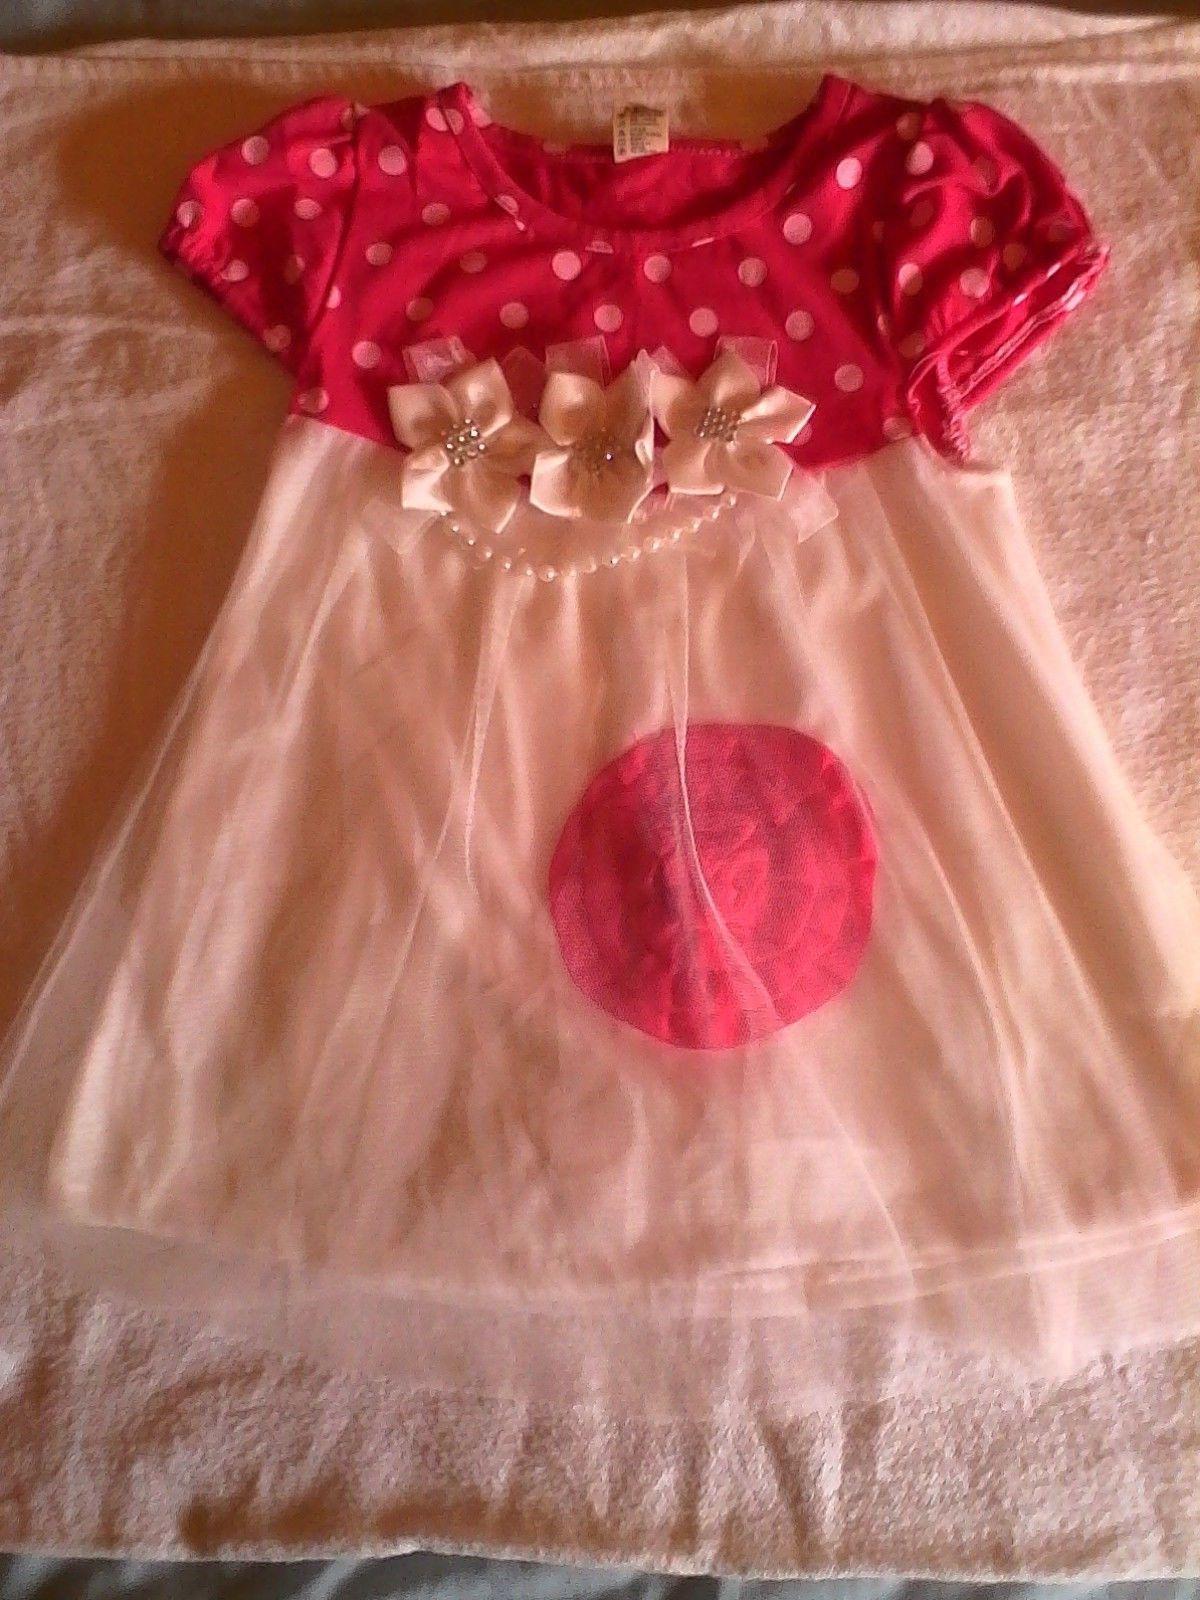 http://www.ebay.fr/itm/Magnifique-Robe-T-2-ans-NEUVE/181908369018?_trksid=p2047675.c100005.m1851